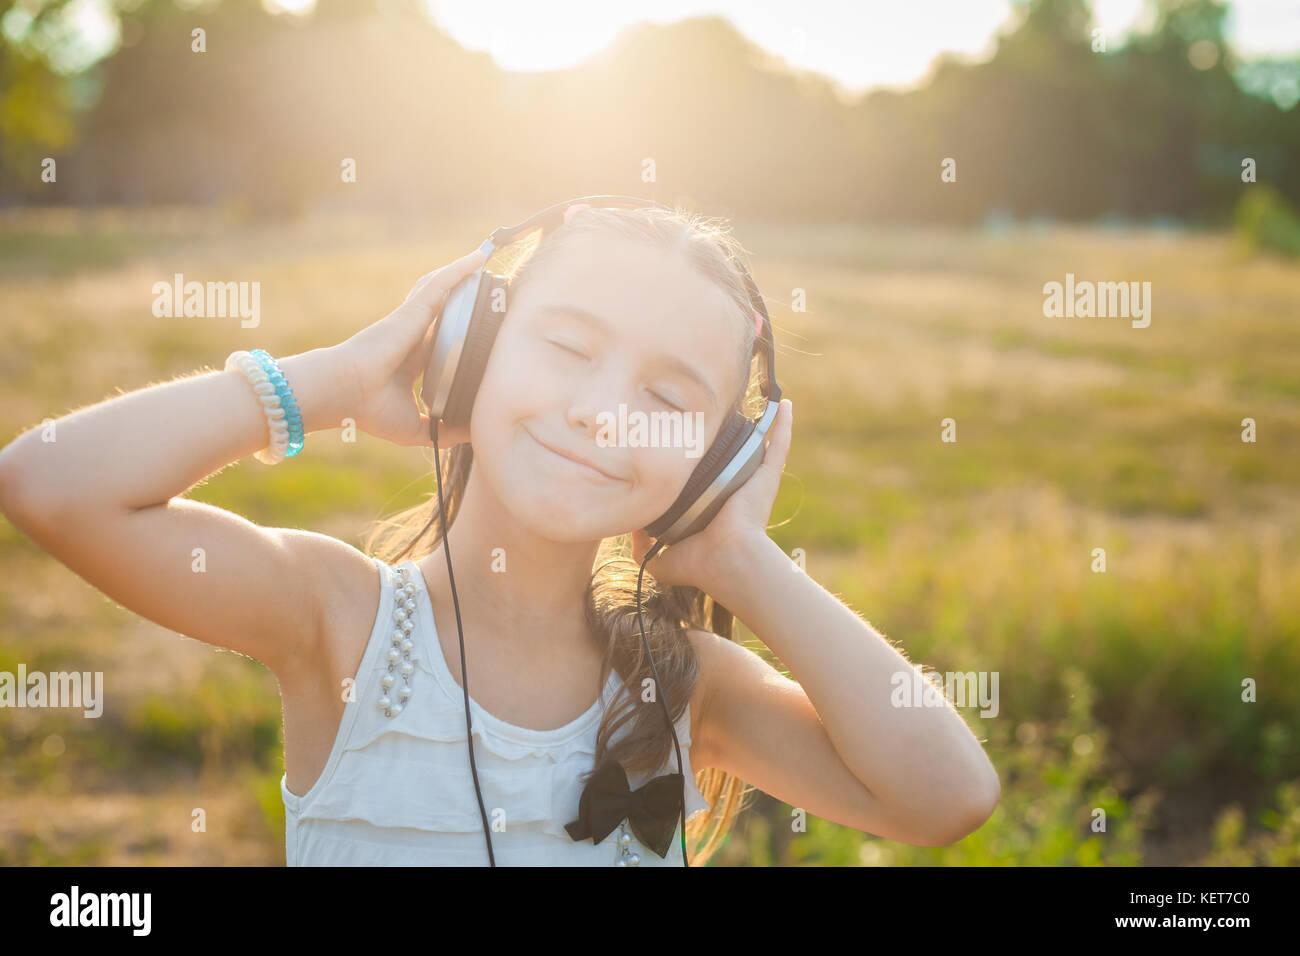 Funny Girl Musik hören mit Kopfhörern Stockbild